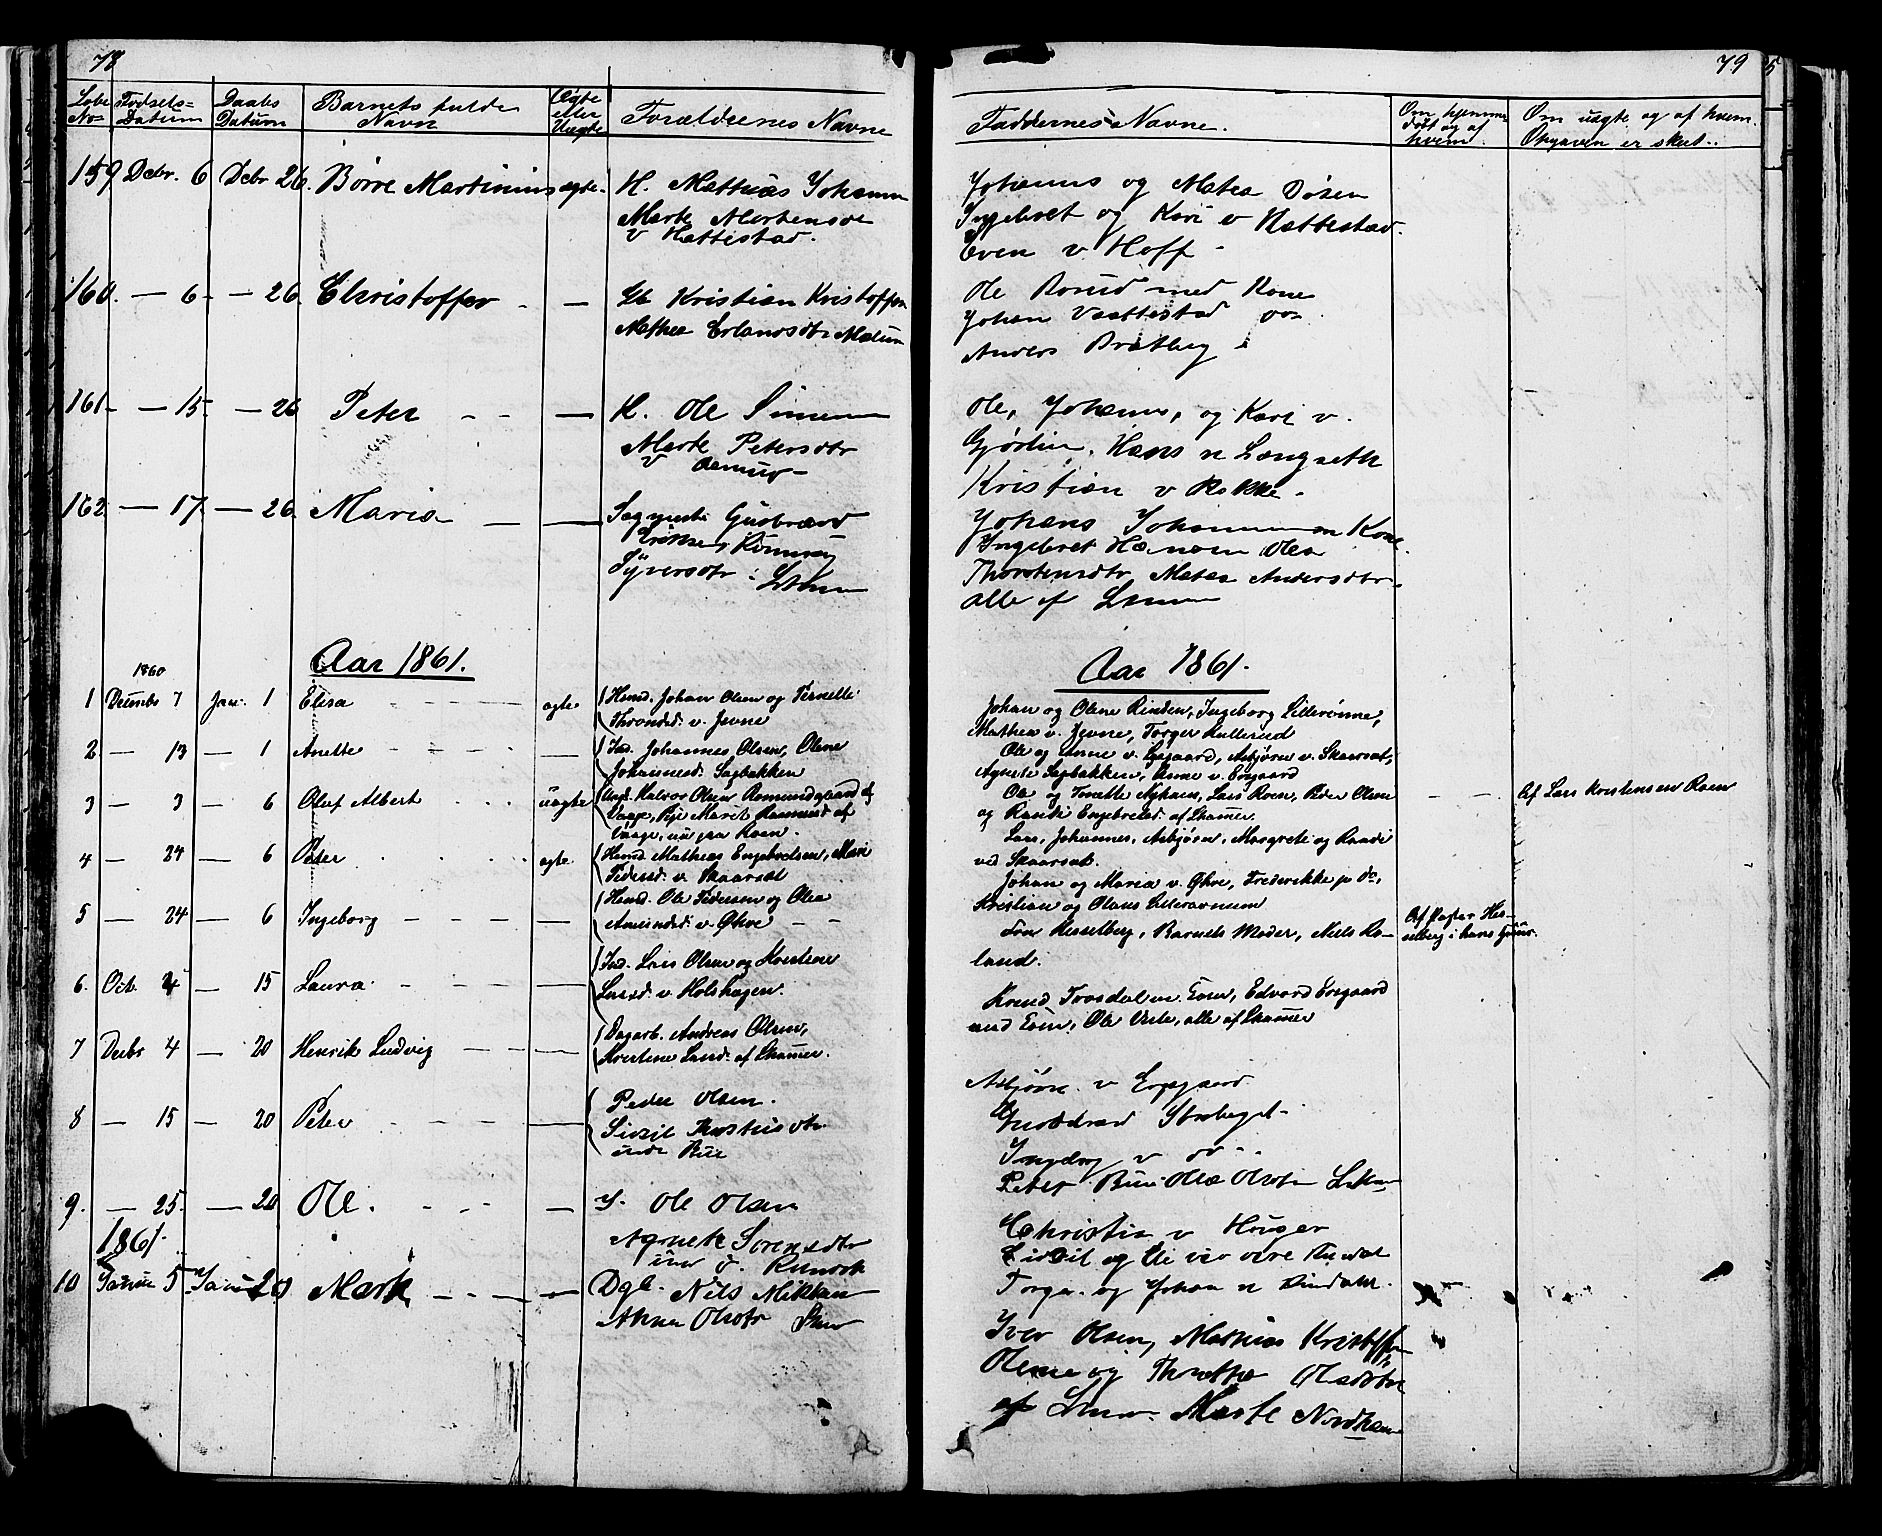 SAH, Fåberg prestekontor, Klokkerbok nr. 7, 1856-1891, s. 78-79